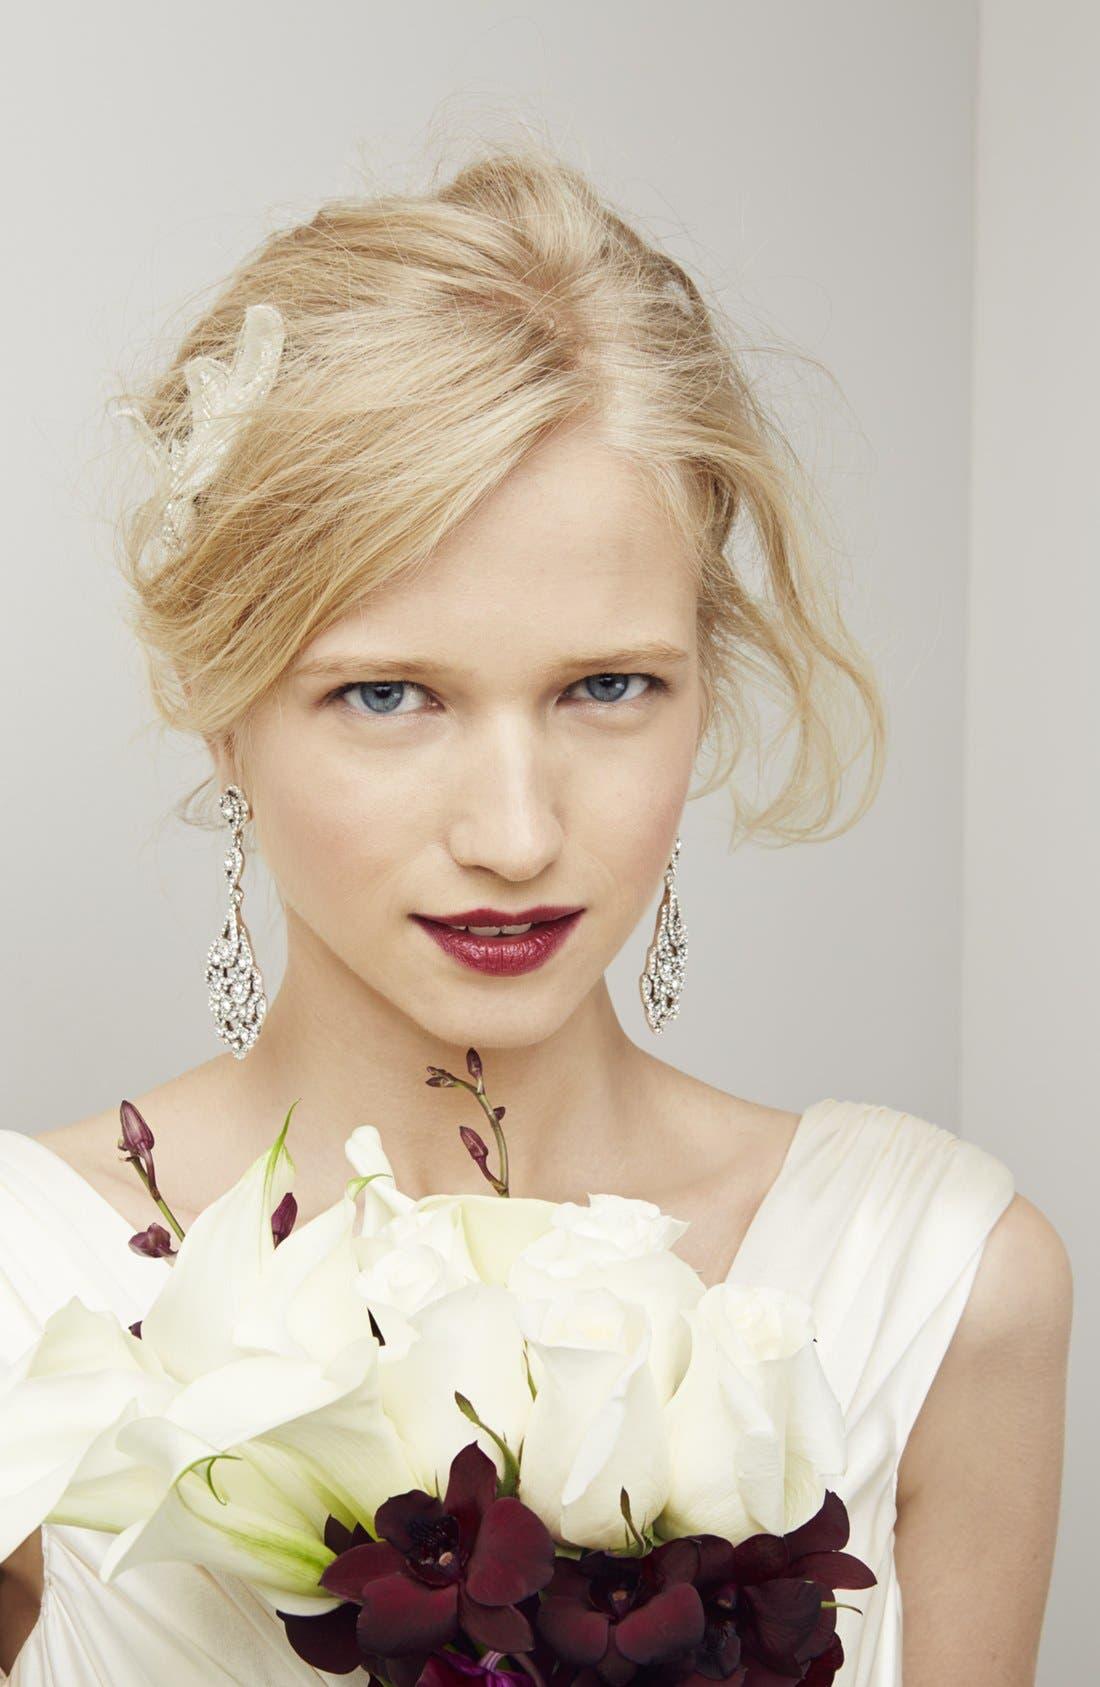 Alternate Image 4  - Untamed Petals by Amanda Judge 'Bianca' Floral Beaded Head Wrap